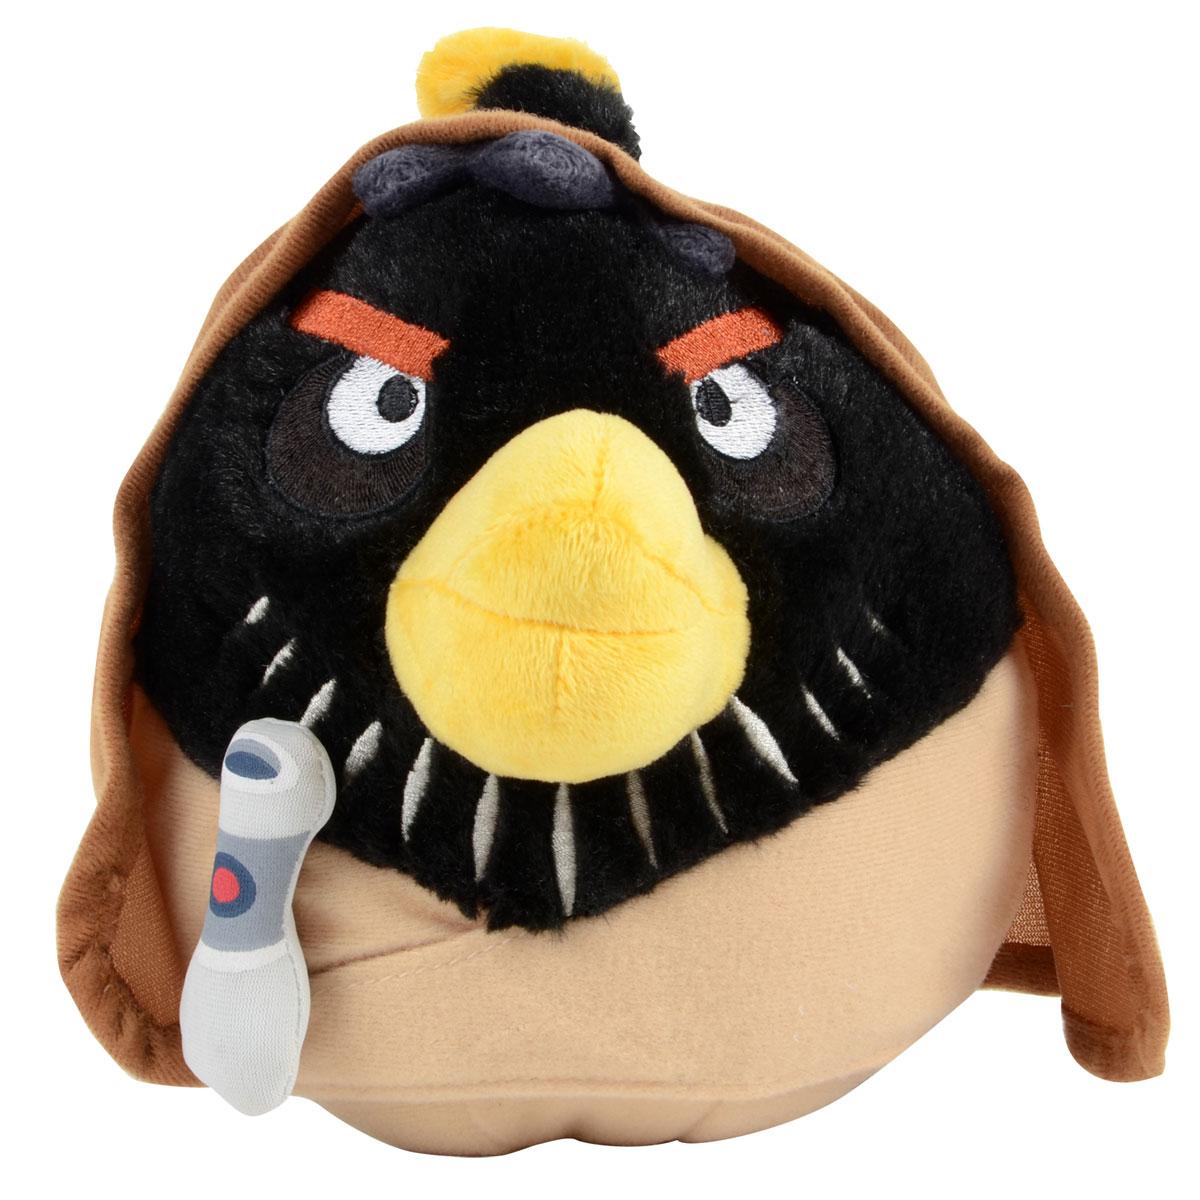 Angry Birds ������ ���������� ������� Star Wars: Obi-Wan Kenobi, 27 �� - Angry Birds - Angry Birds94065�_������������ ���������� ������� Angry Birds Star Wars: Obi-Wan Kenobi ������� ������ ������� ����� ������� � �������. ����������� �������� �� ����� ������� ��������� � ���� �������� ������ ����� �� ���������� ���� Angry Birds - ���-��� ������. ��� ������� �� ������, ������������� �� �������, ������� �������� �������� �������� �����. �������� ������ ������� ���������� �������� ���������� ������ ���������� � ������ ������������� �������� � ������ ���������. Angry Birds Star Wars - ����������� ����� ���������� ���� Angry Birds. ���� ��������� � ������� �� ������� ������ ������� �����. ������� �������� �� ������������ ��������.